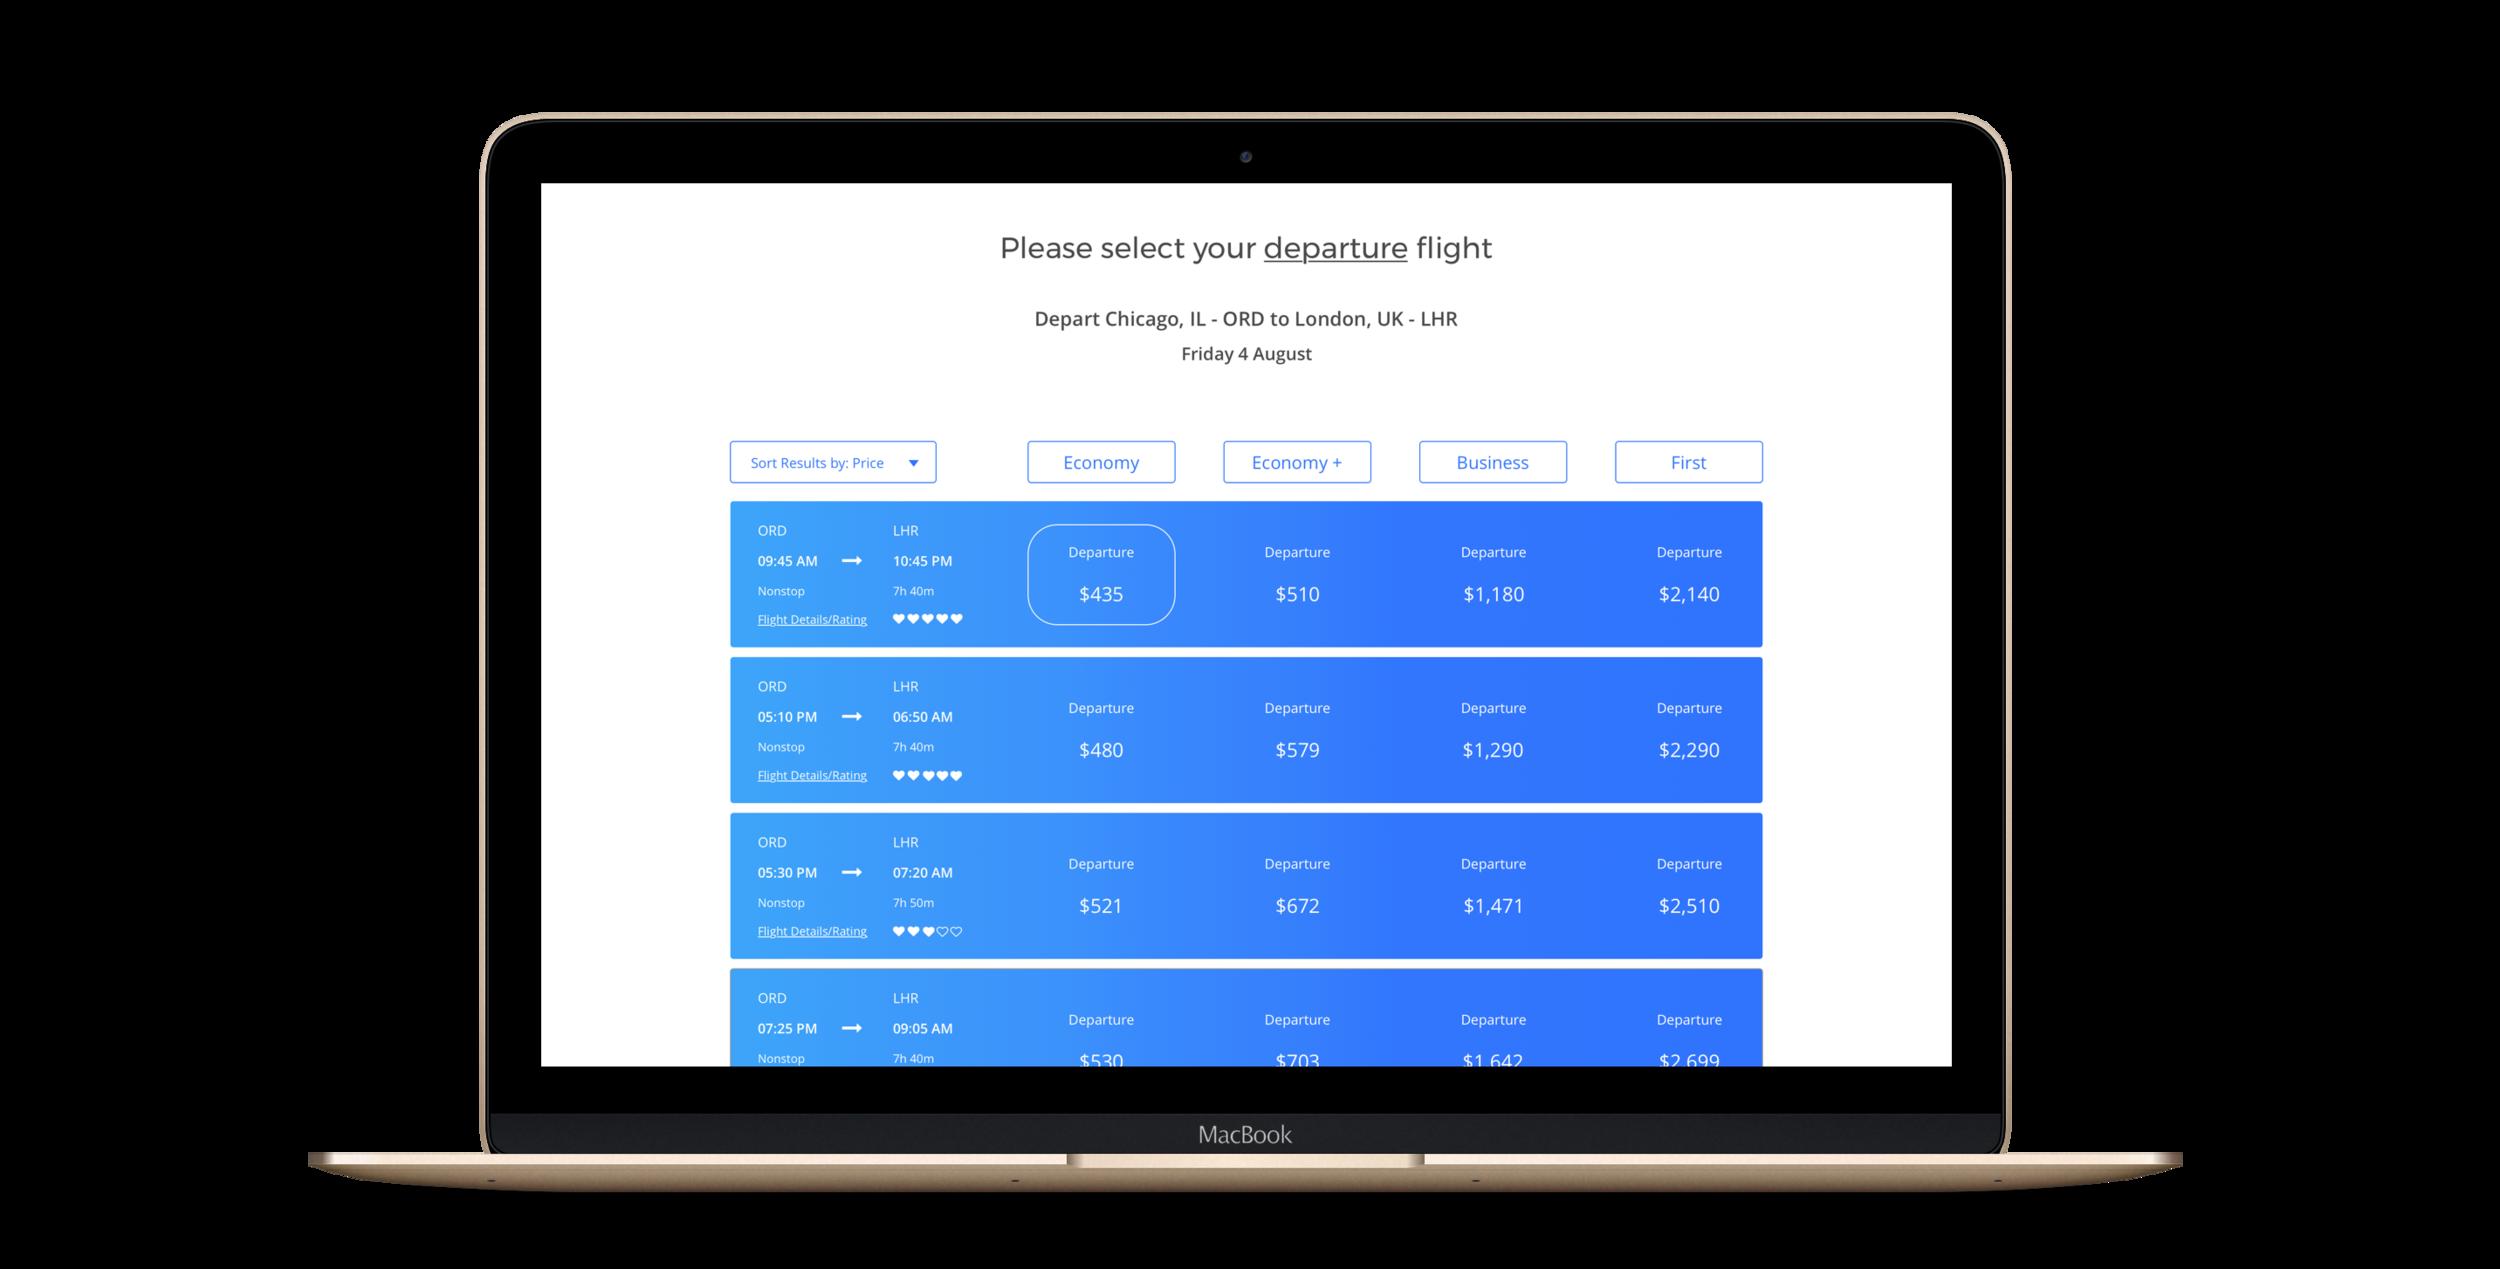 Departure Flight Results